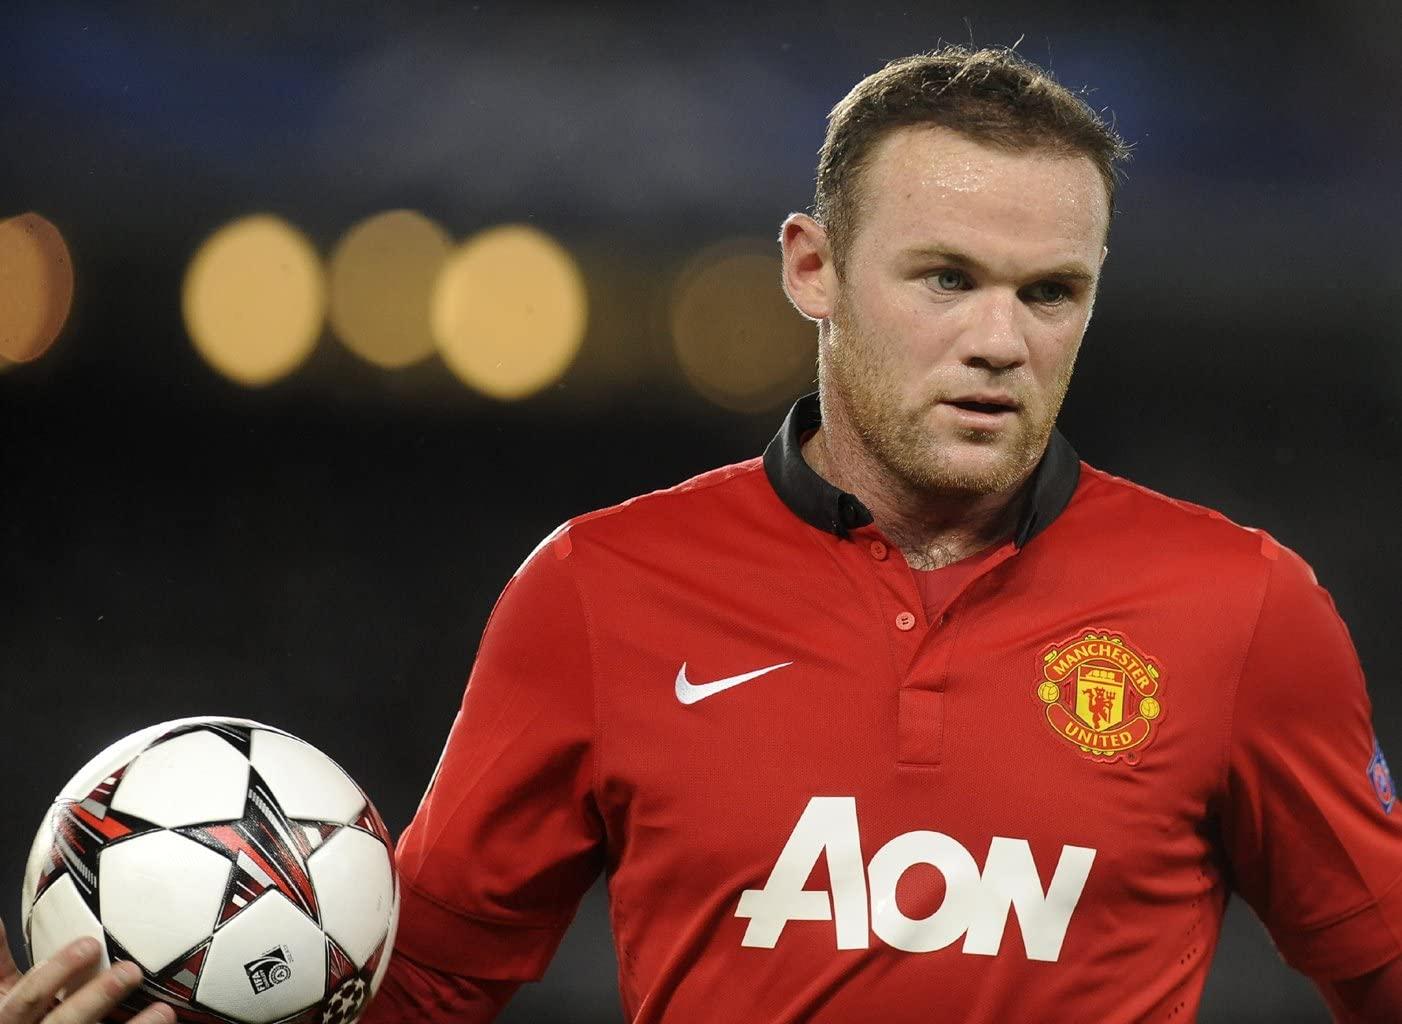 Prints for Me Wayne Rooney - Manchester United F.C. England #03-18X24 Metal Aluminum Wall Art